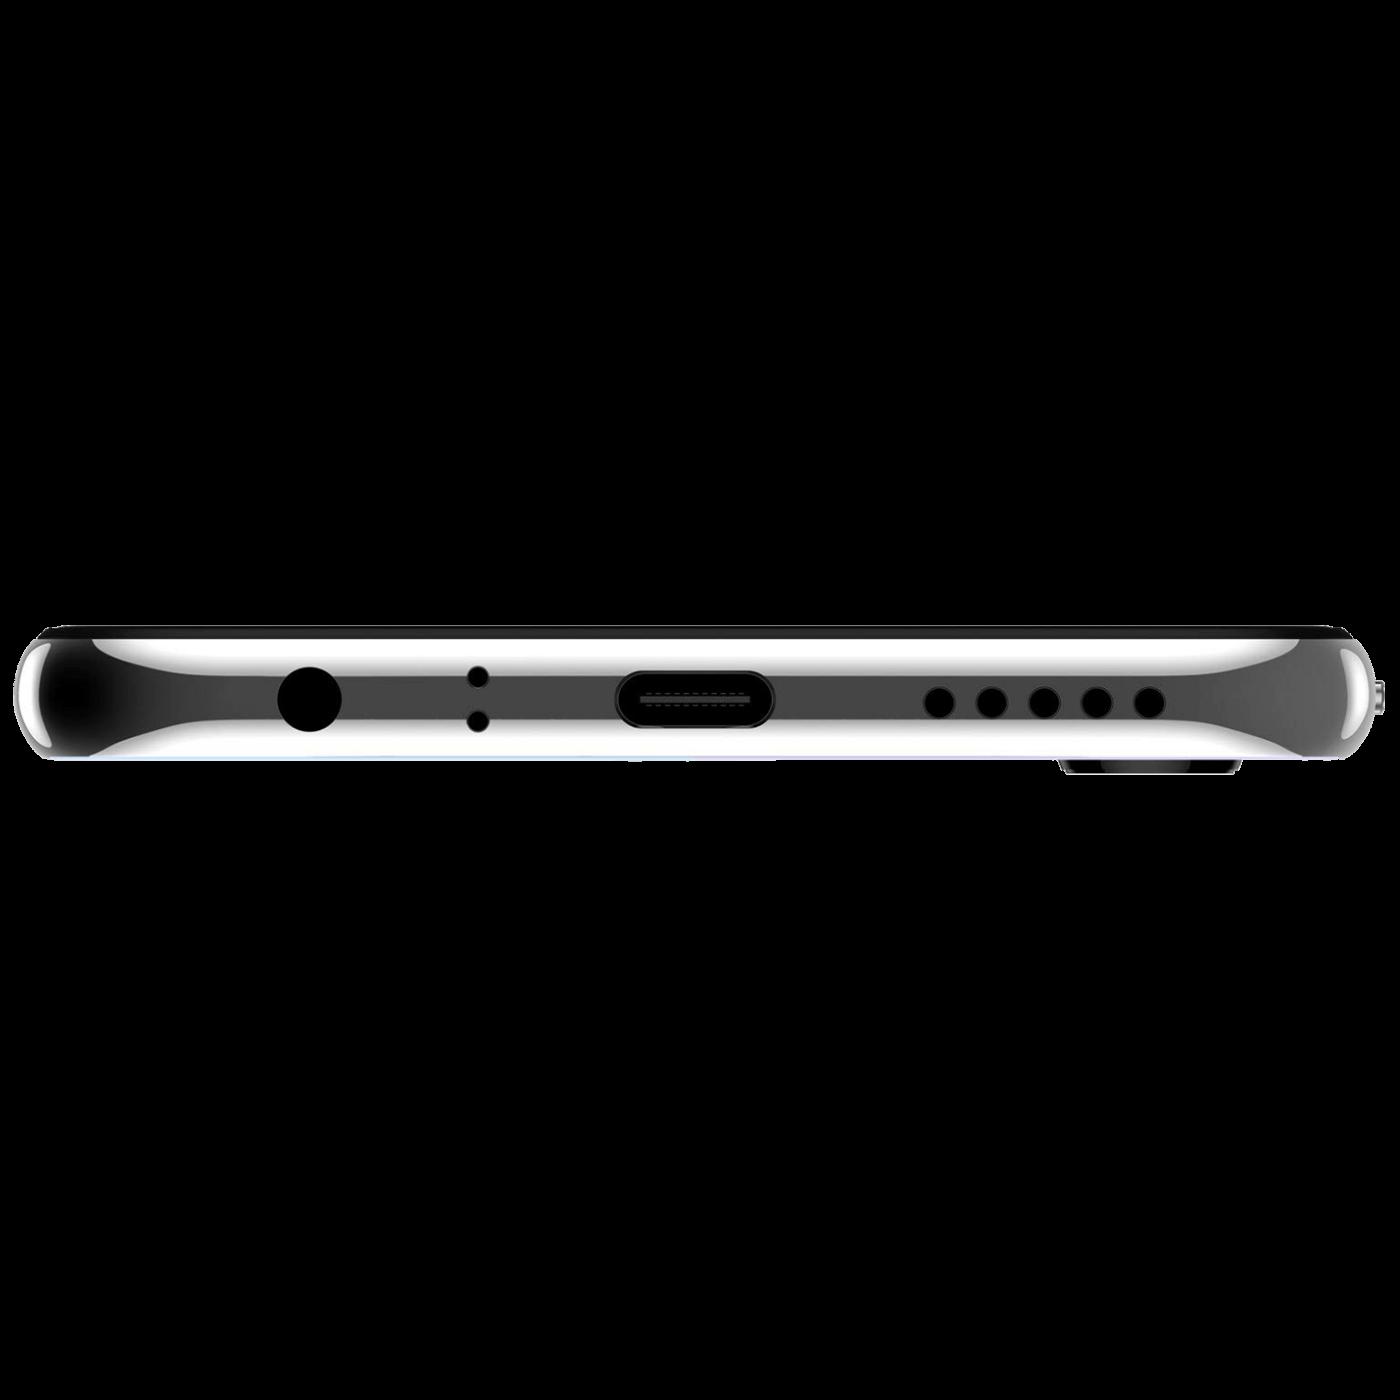 Redmi Note 8,4/64GB Moonlight White